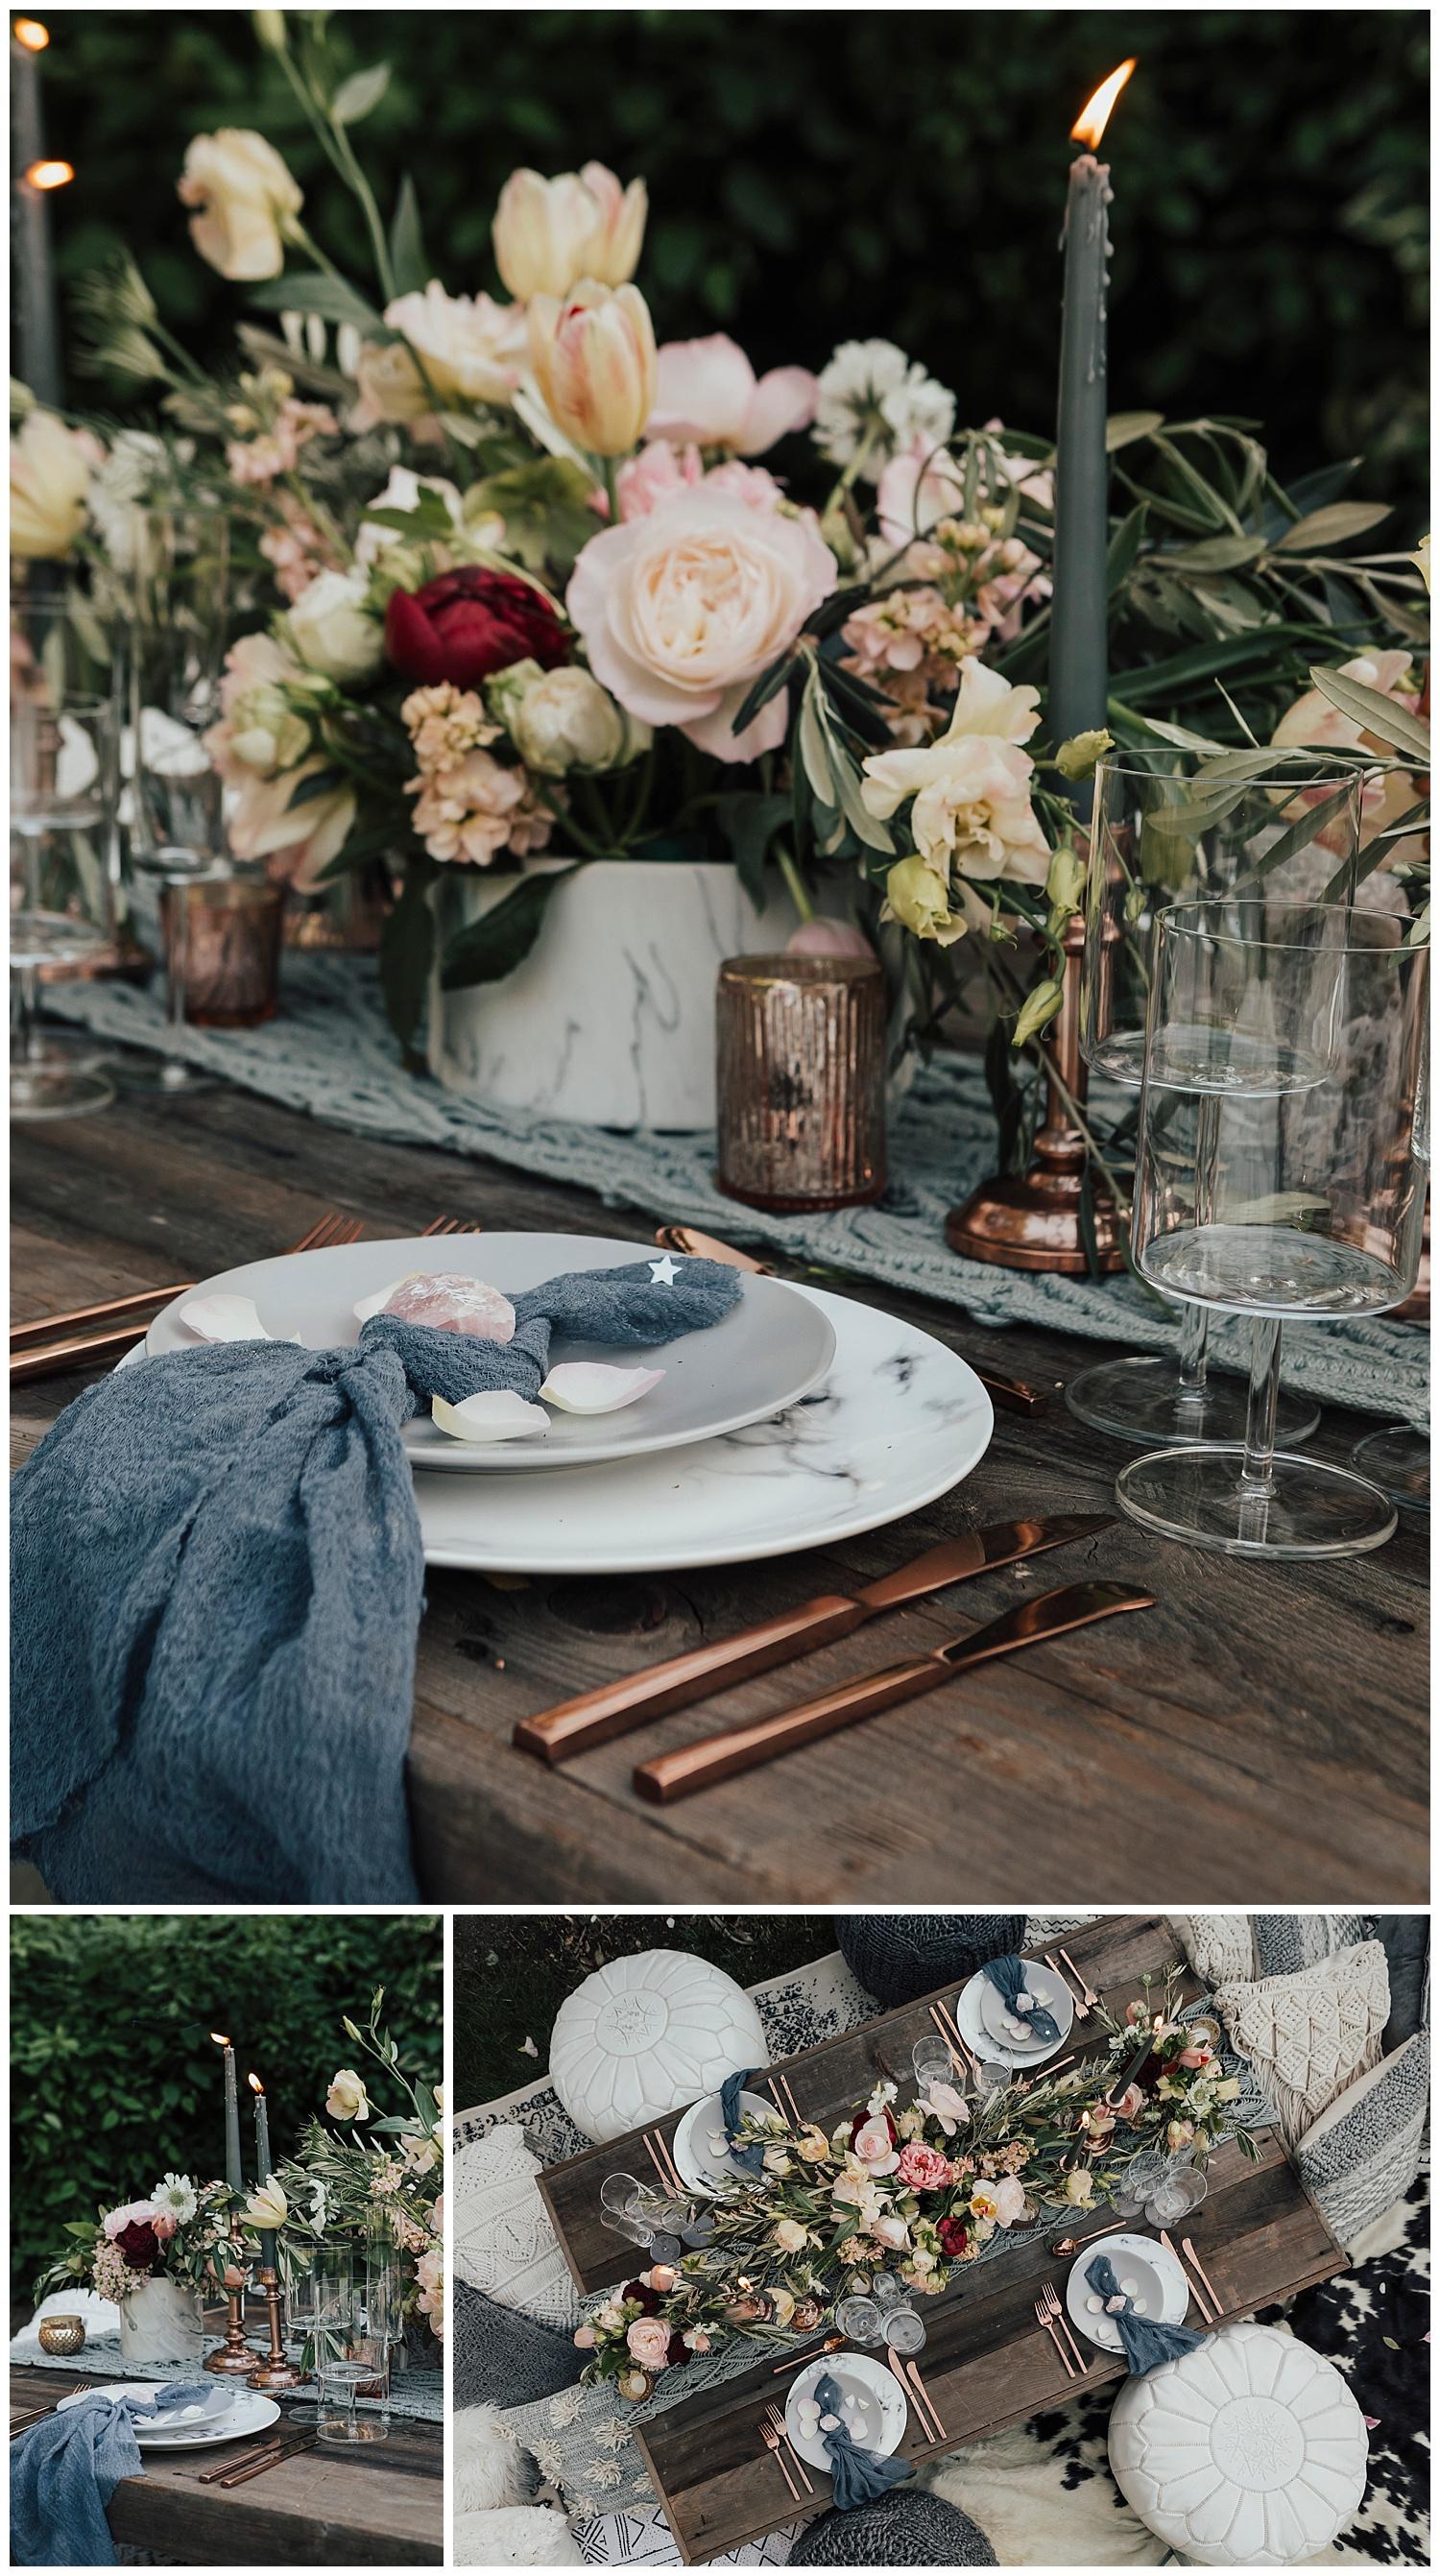 gardner-ranch-wedding-setting.jpg